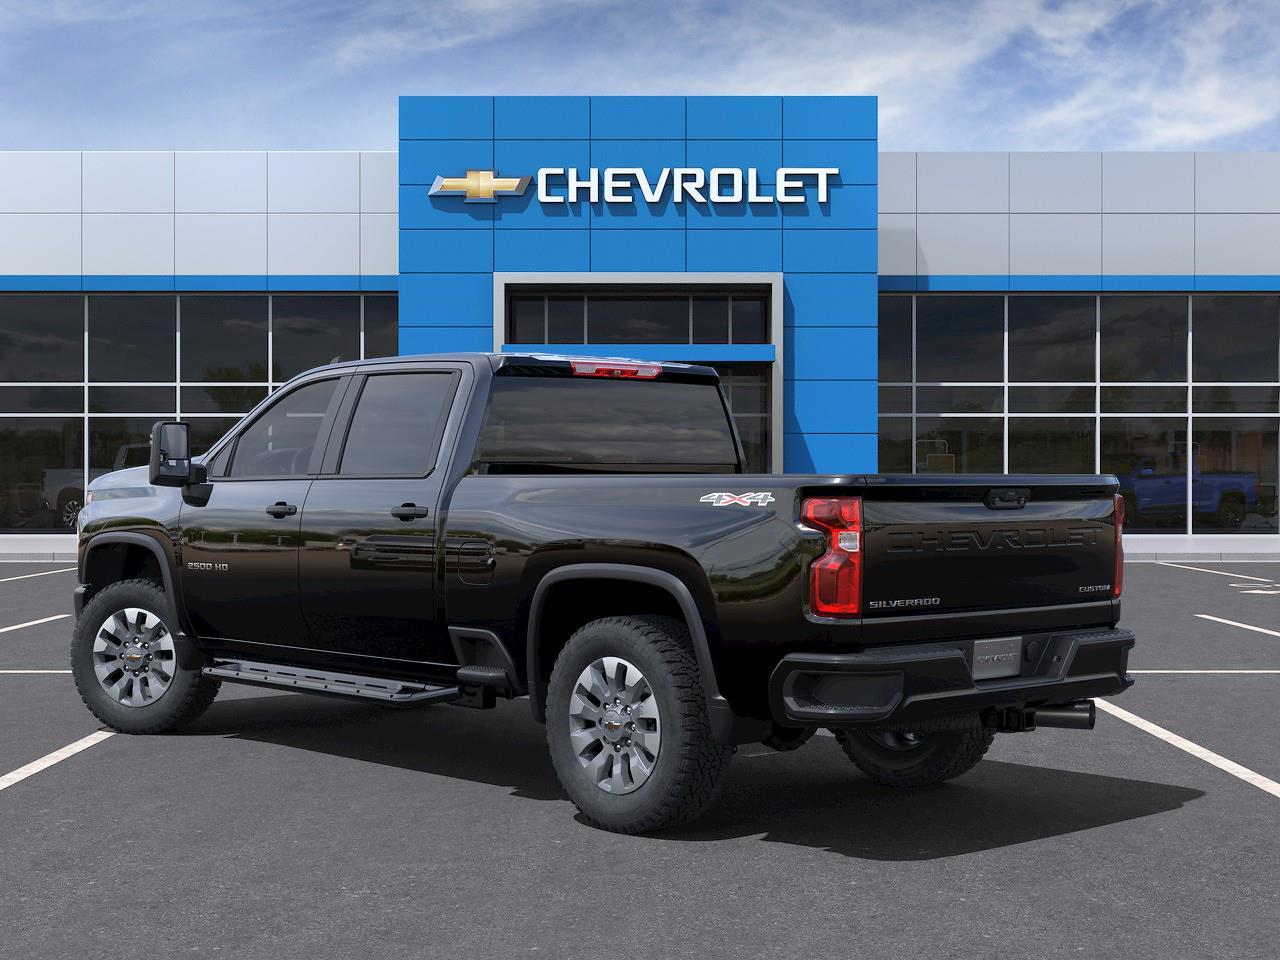 2021 Chevrolet Silverado 2500 Crew Cab 4x4, Pickup #Q210455 - photo 4